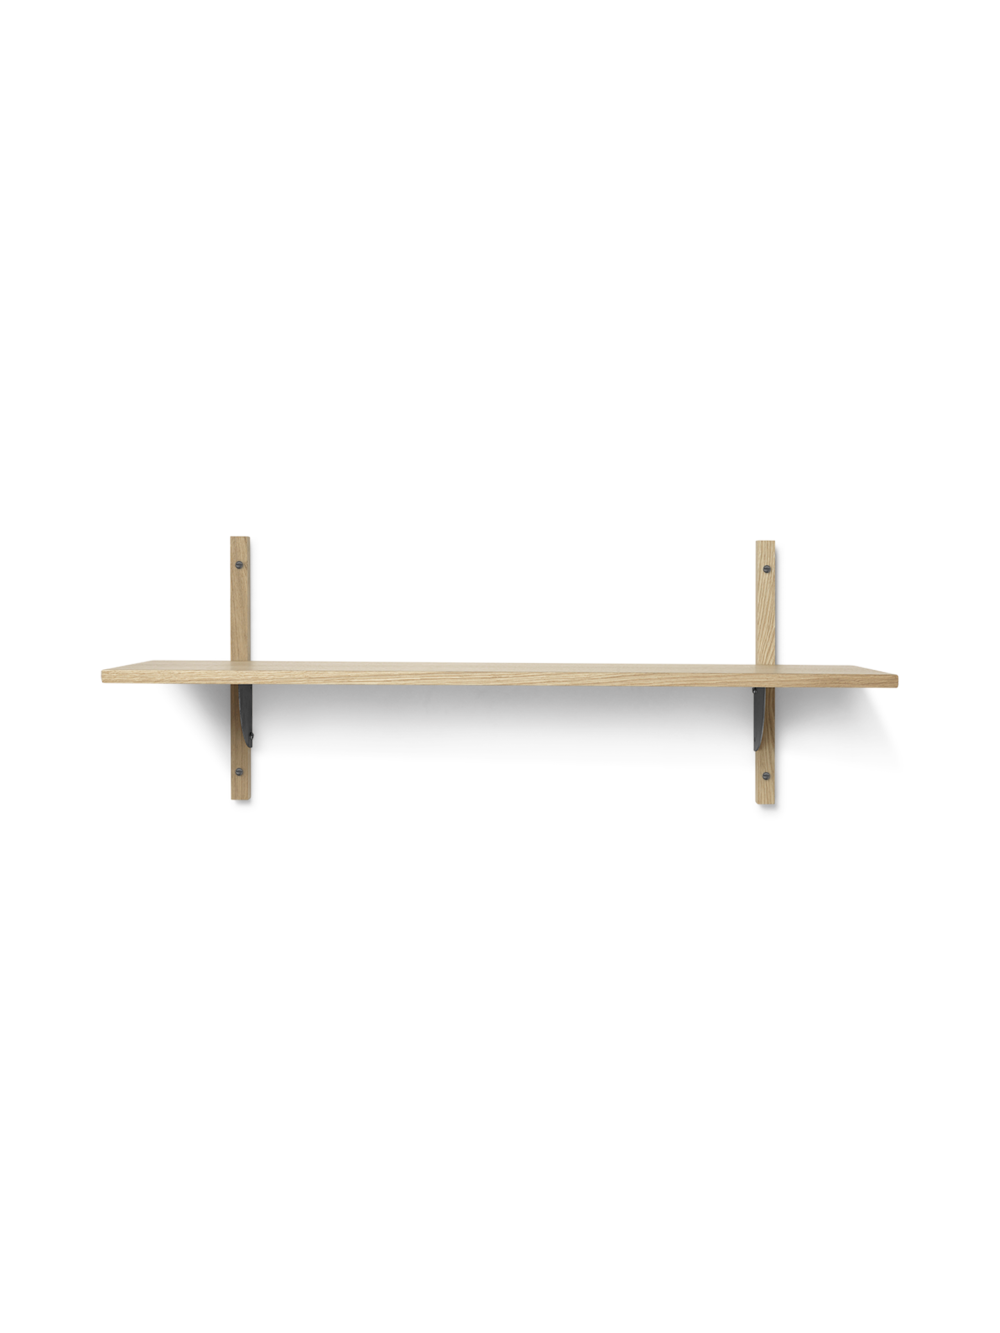 Sector Shelf - Single - Wide - Natural - Black Brass